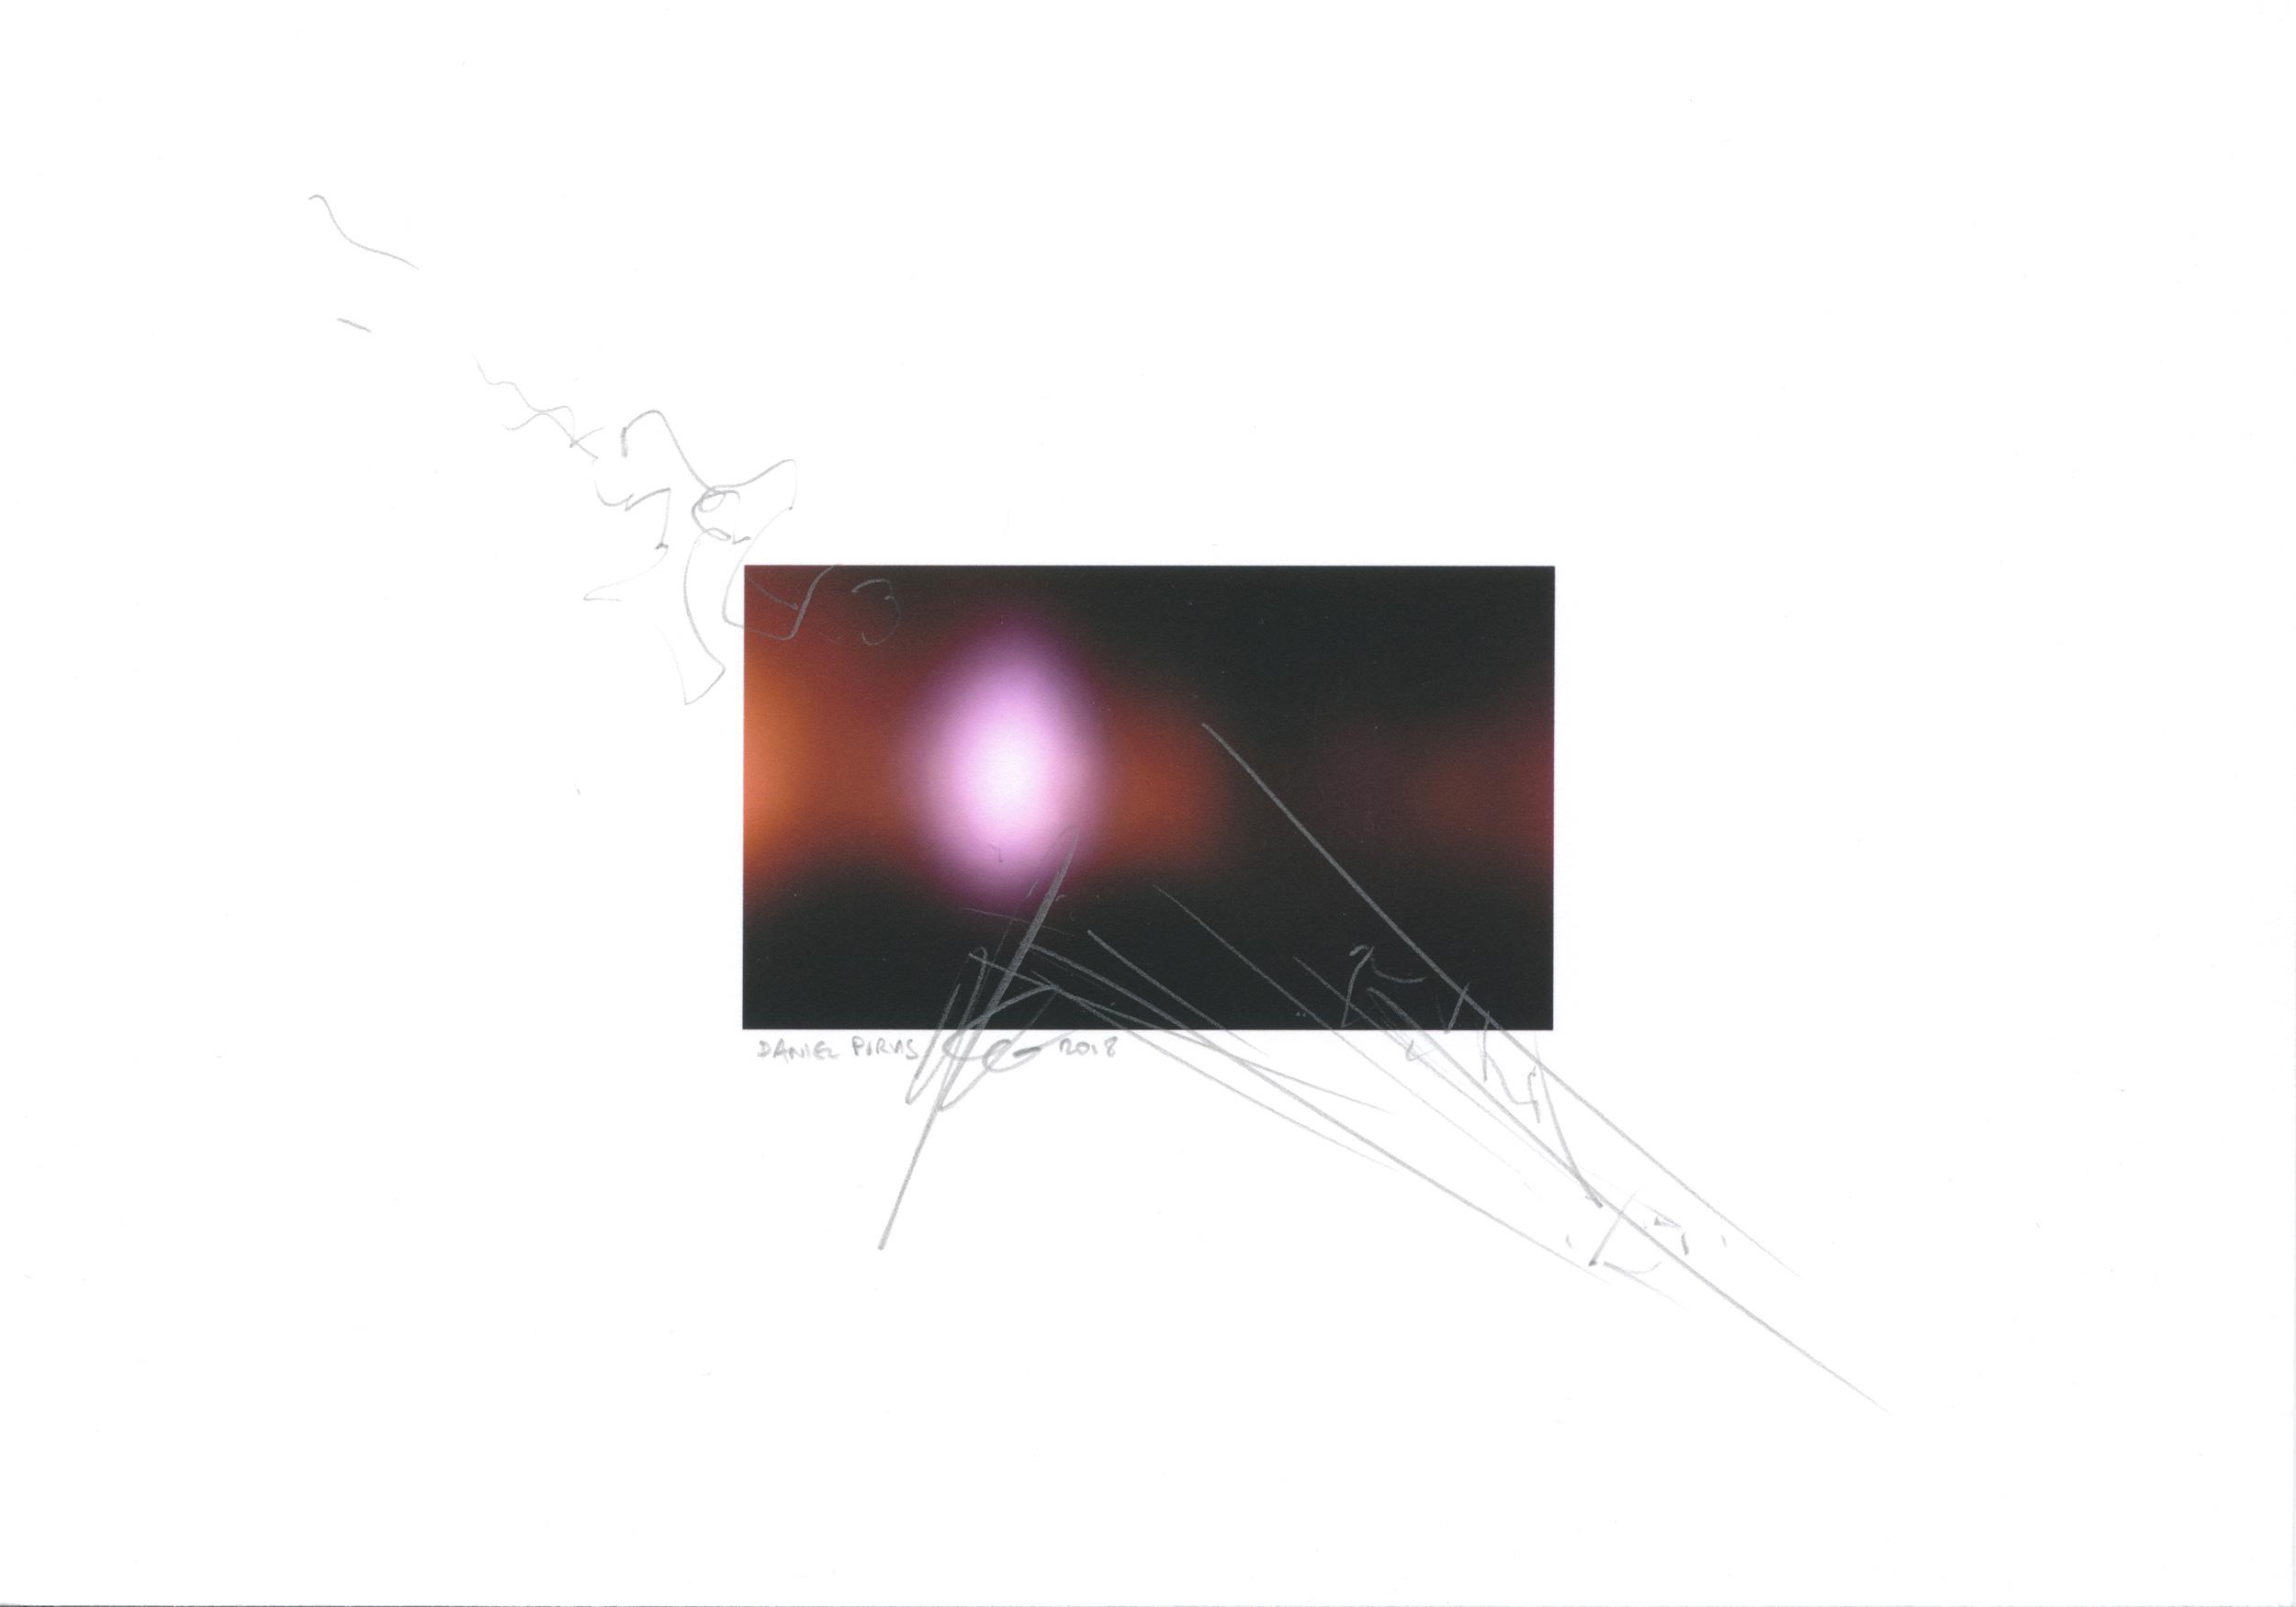 SkrambledEggs-DanielPurvis-Abyss-20x14.jpg